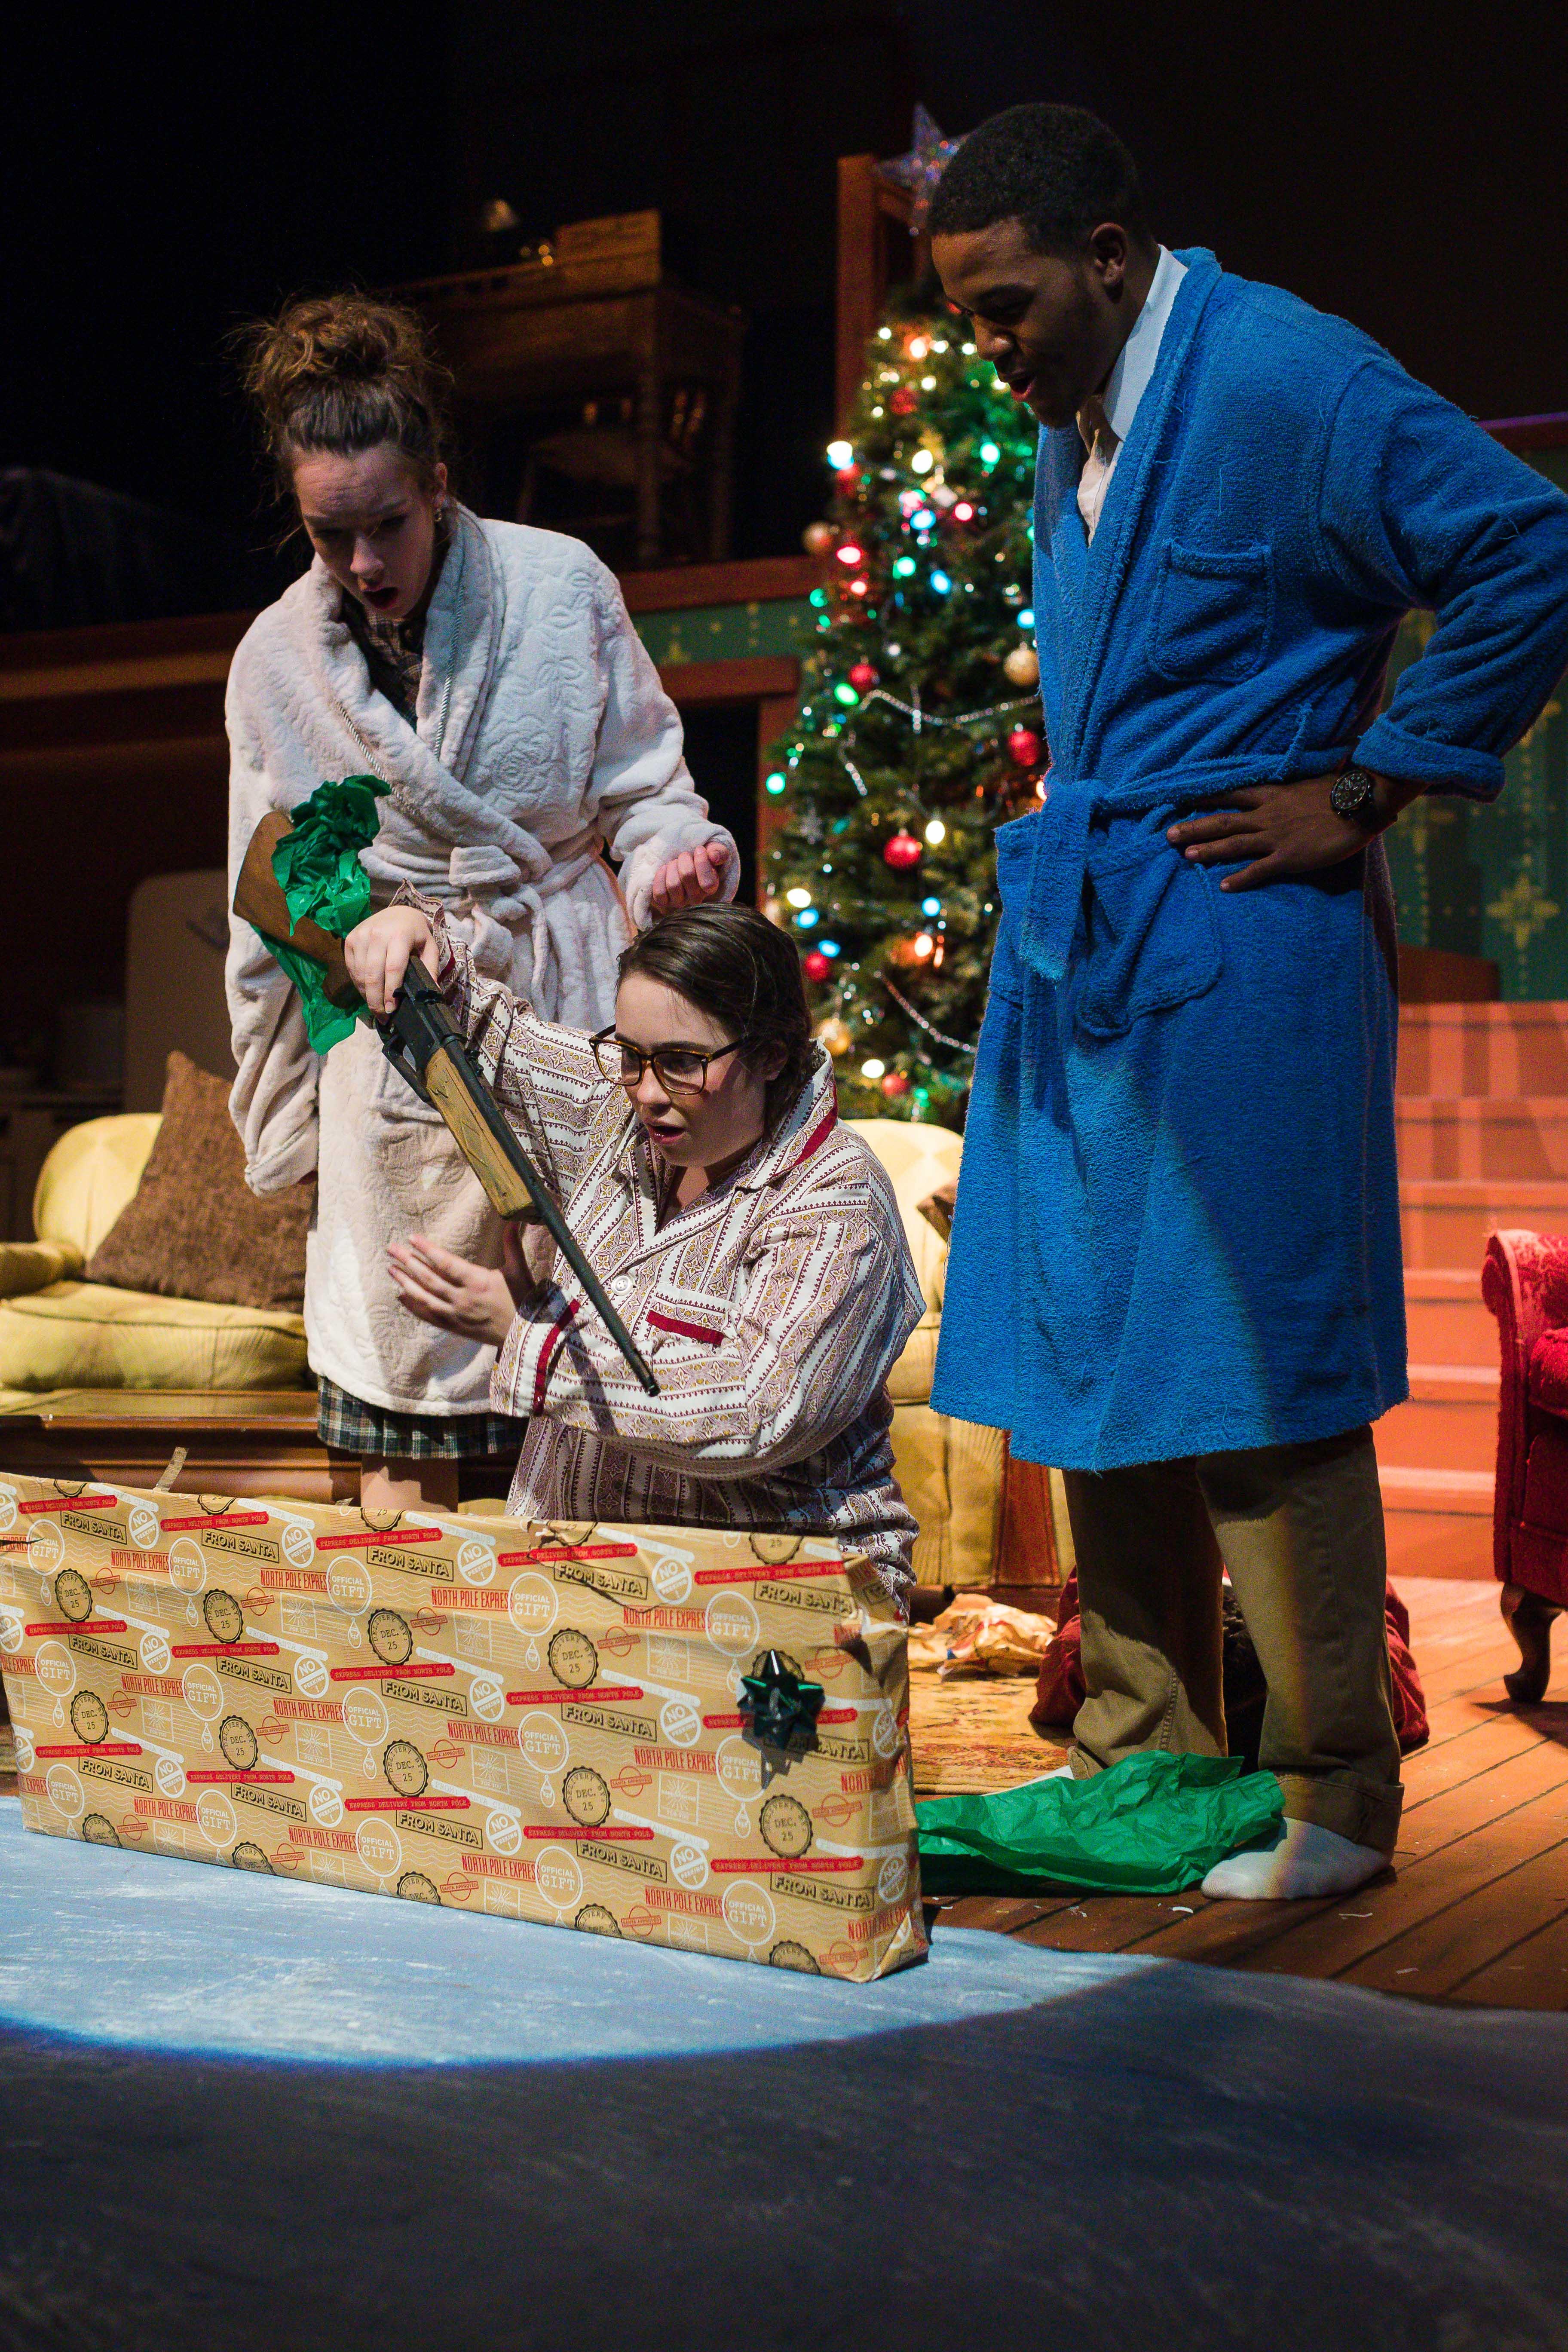 Weaver_Christmasshoot-_MG_1546